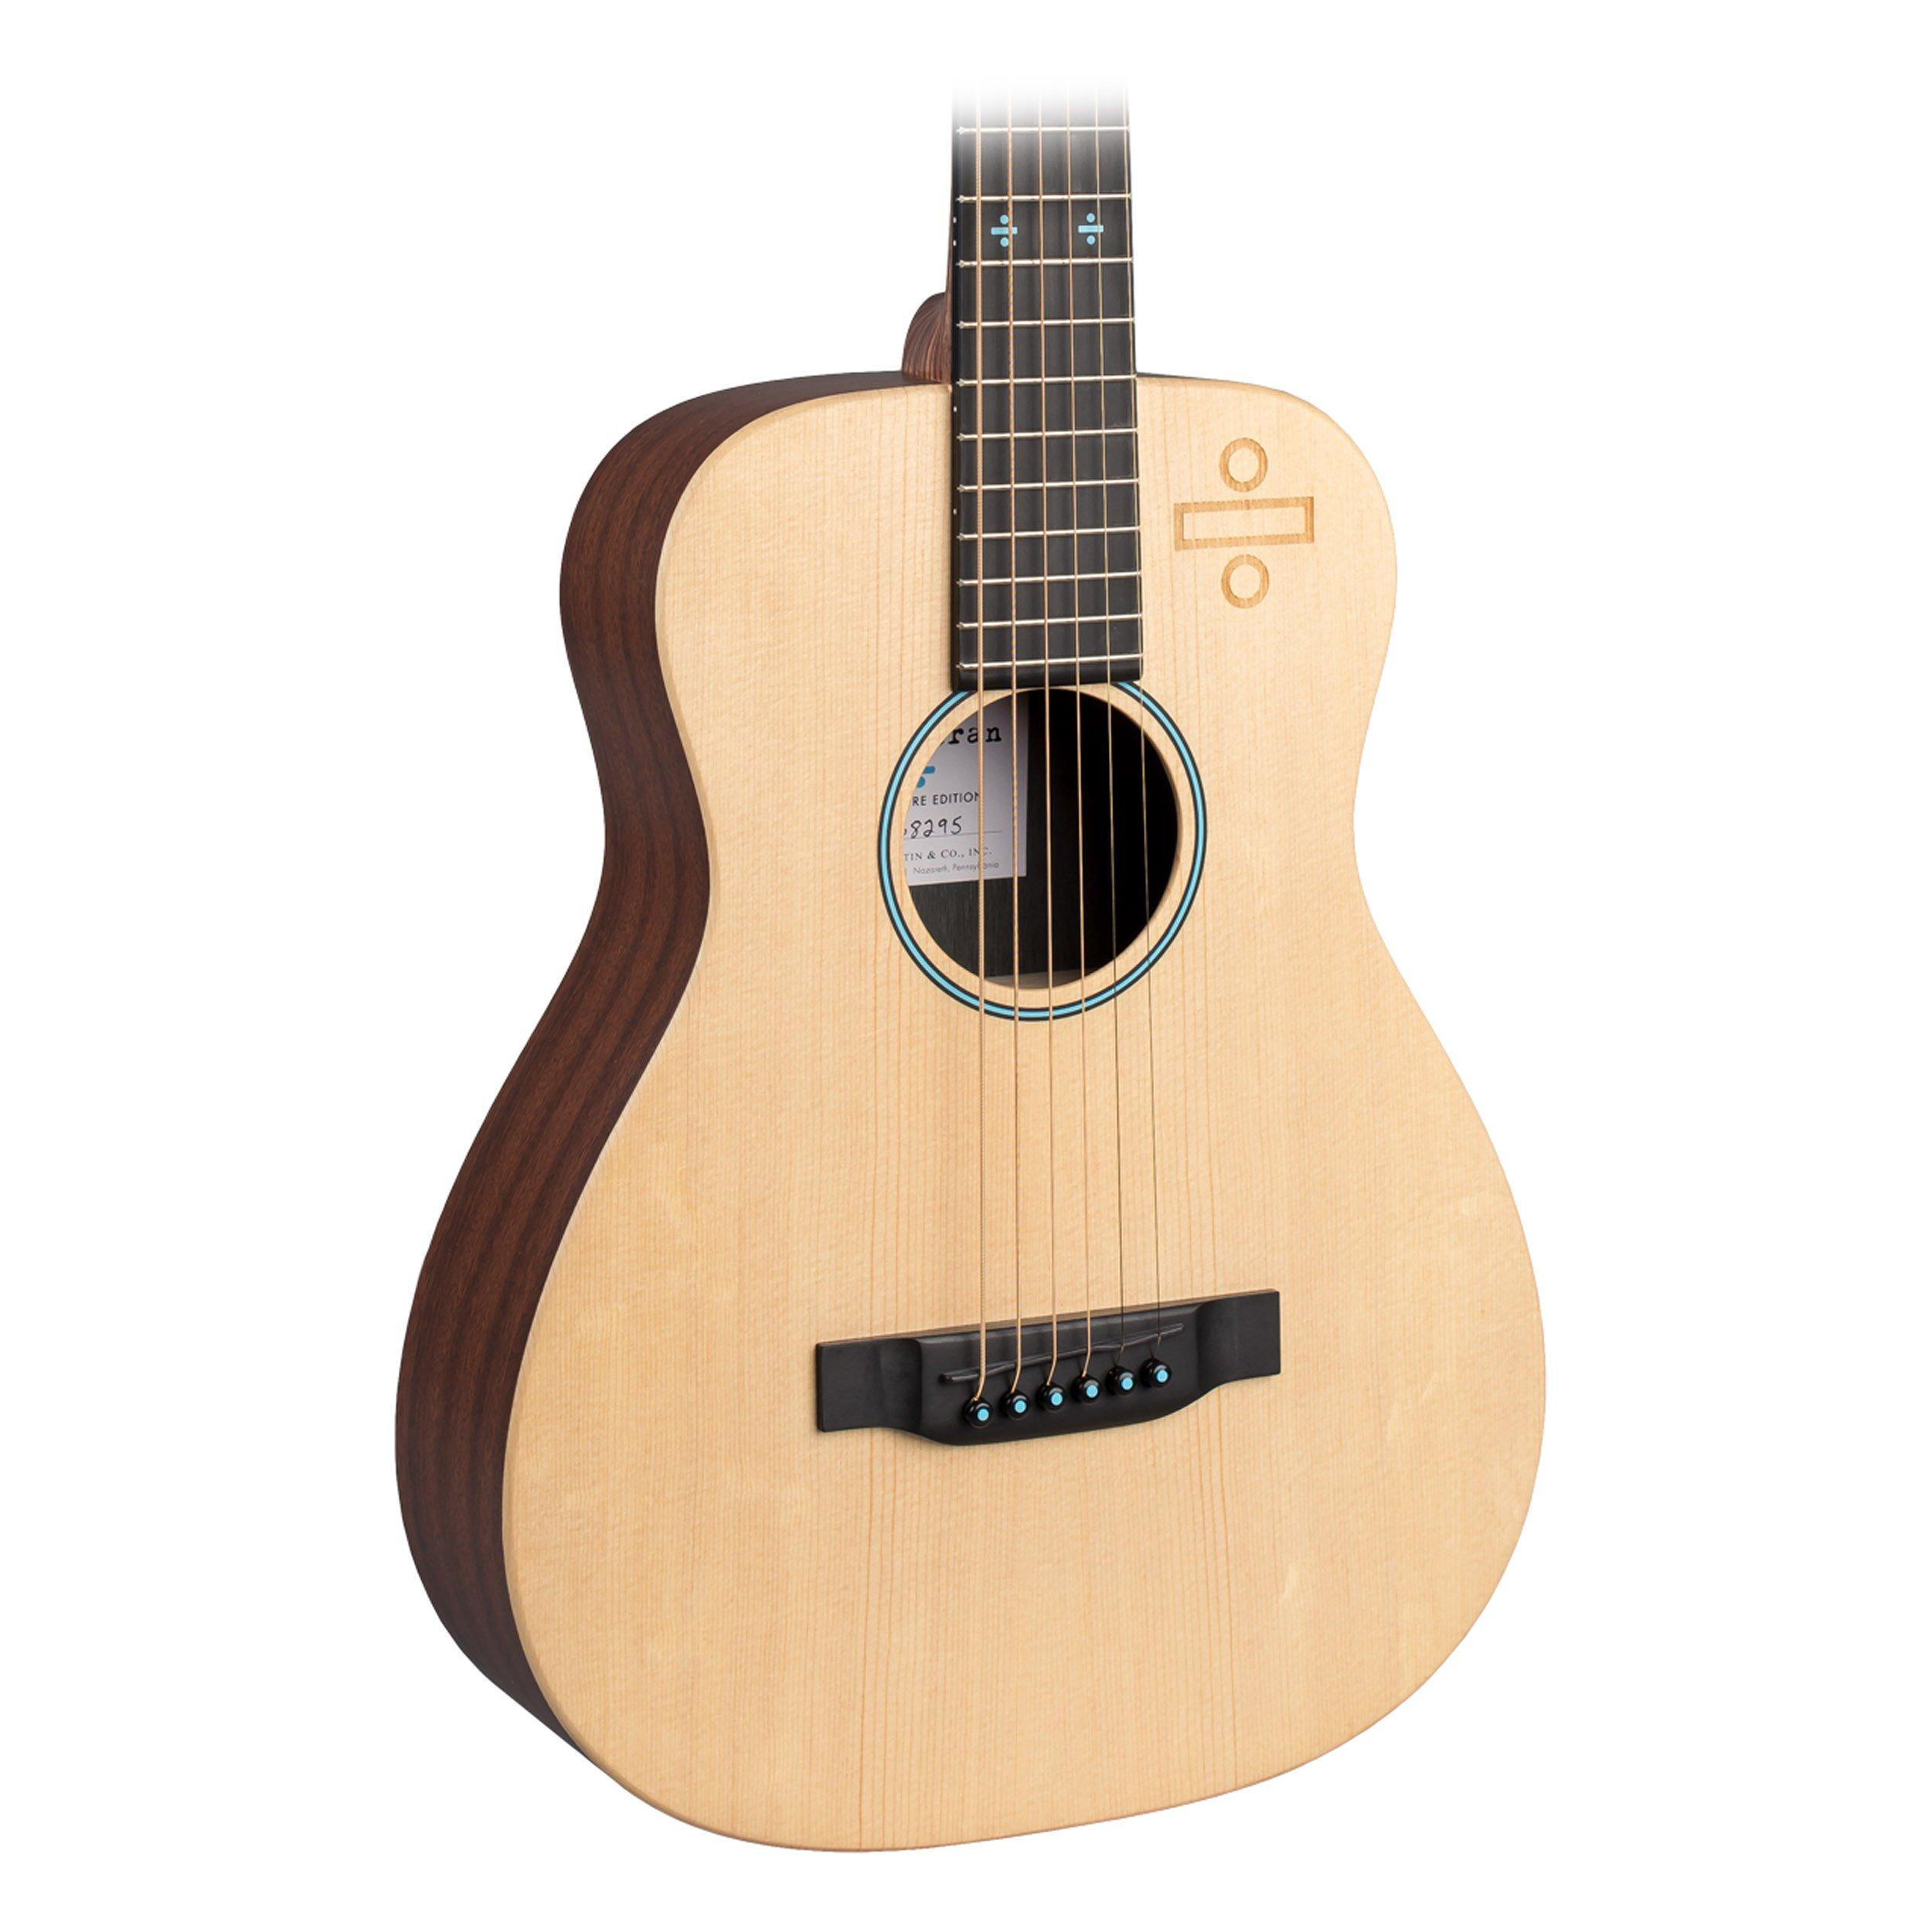 Martin Ed Sheeran 3 Divide / Signature Edition Little Martin Acoustic-Electric Guitar Natural by Martin